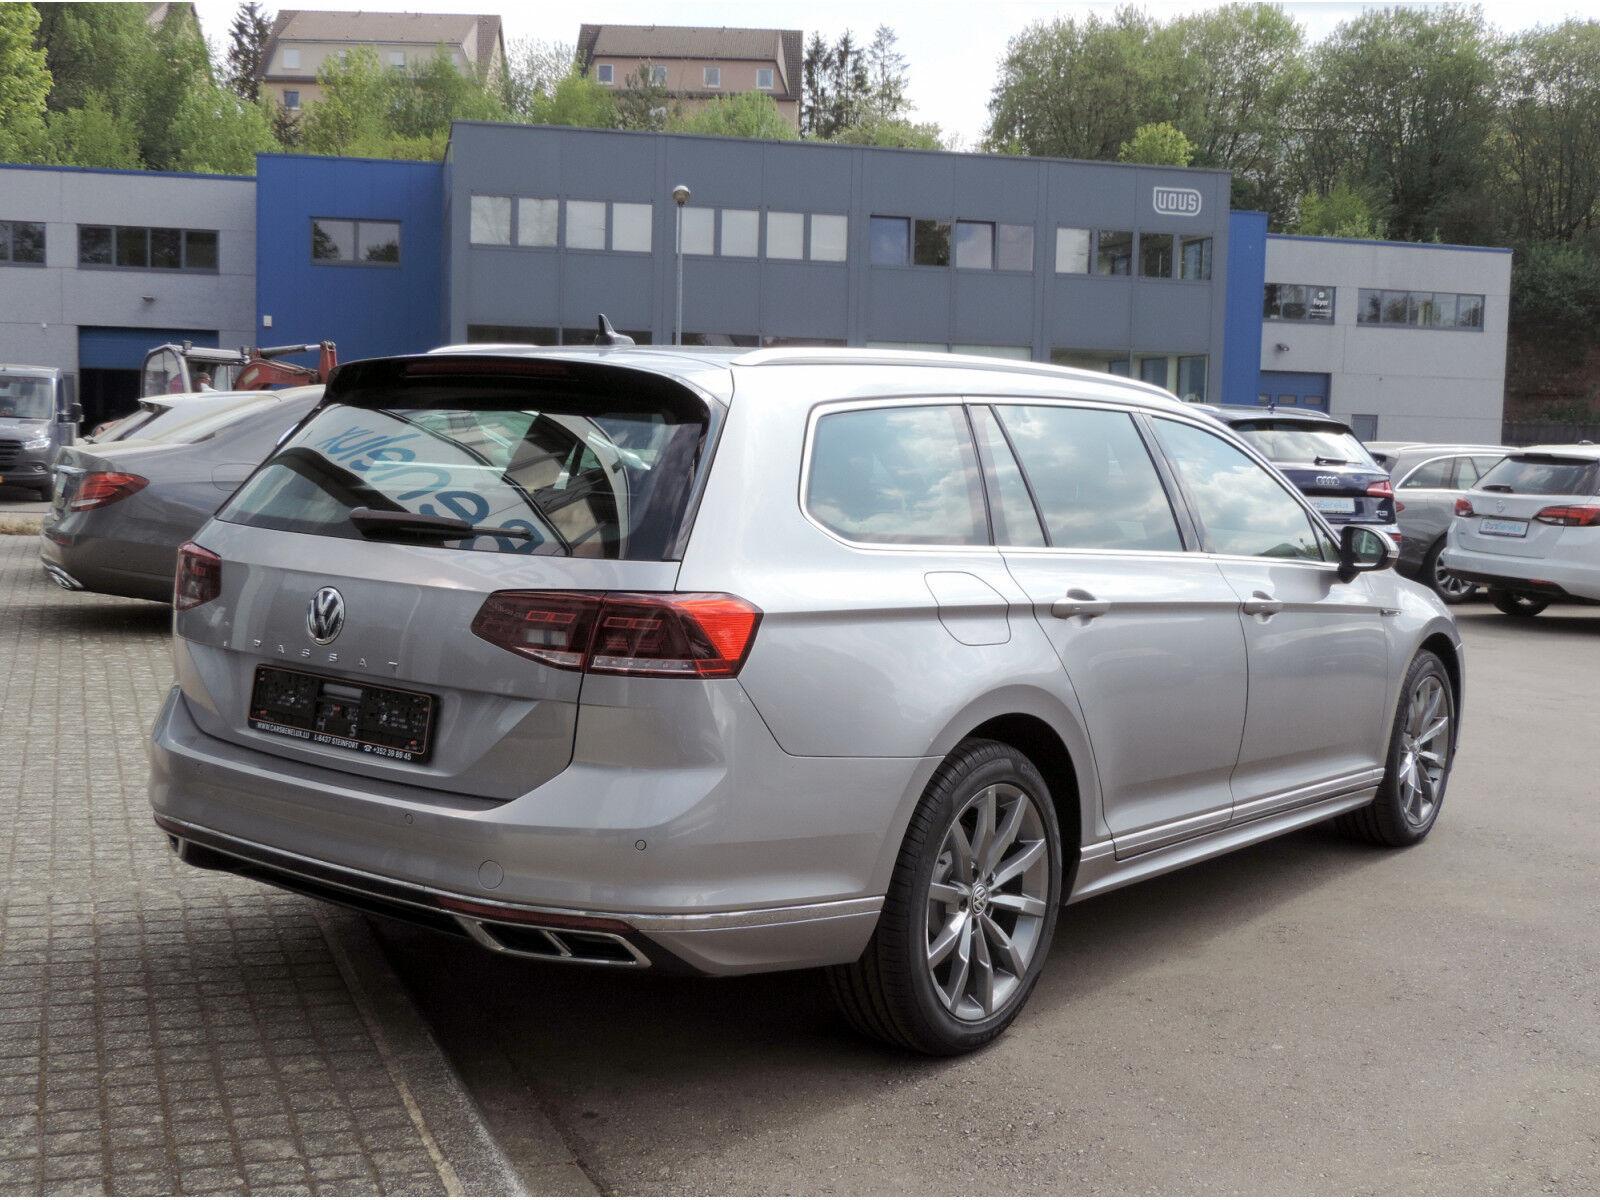 Volkswagen Passat Variant 2.0 TSI R-Line DSG CUIR GPS ACC LANE NEUVE 3/15